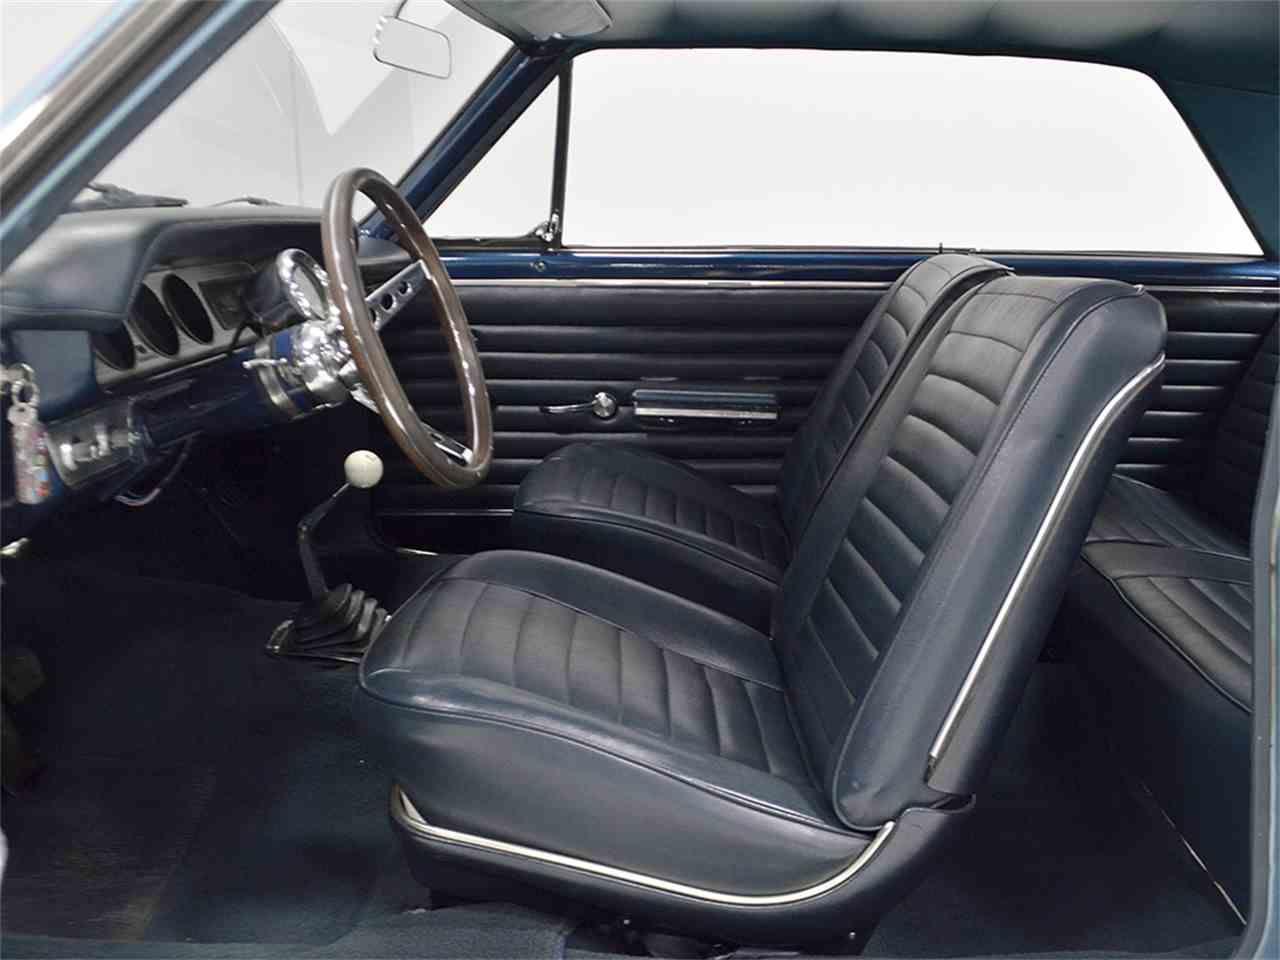 1964 Pontiac GTO Interior for sale | Listing ID: CC-1048016 ...